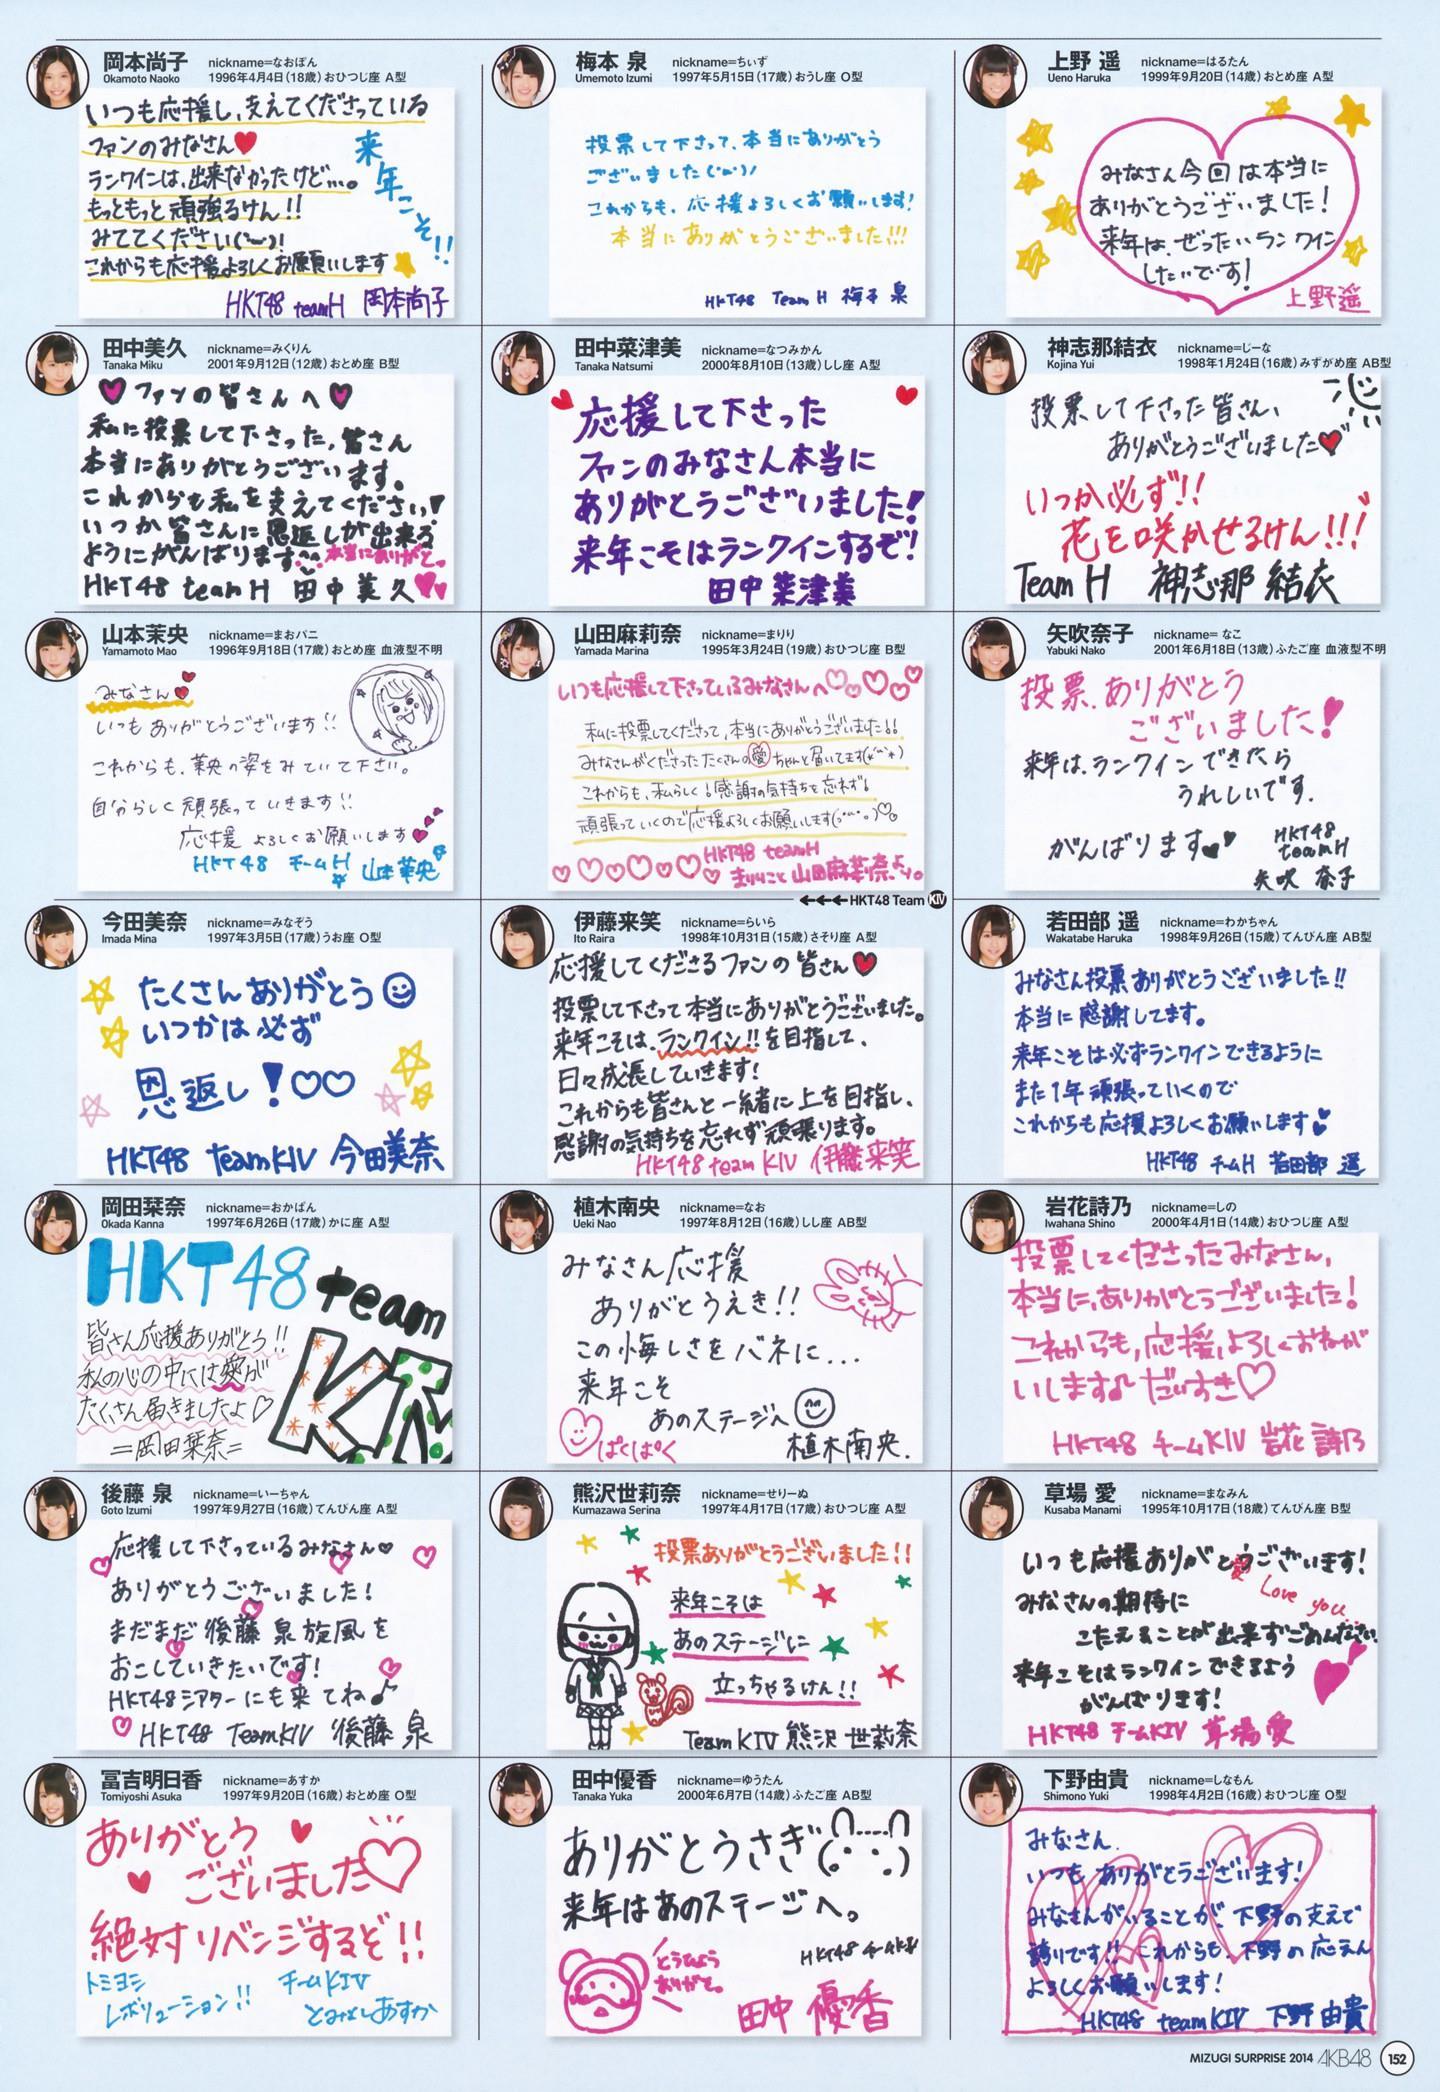 AKB48人気メンバー 画像 139